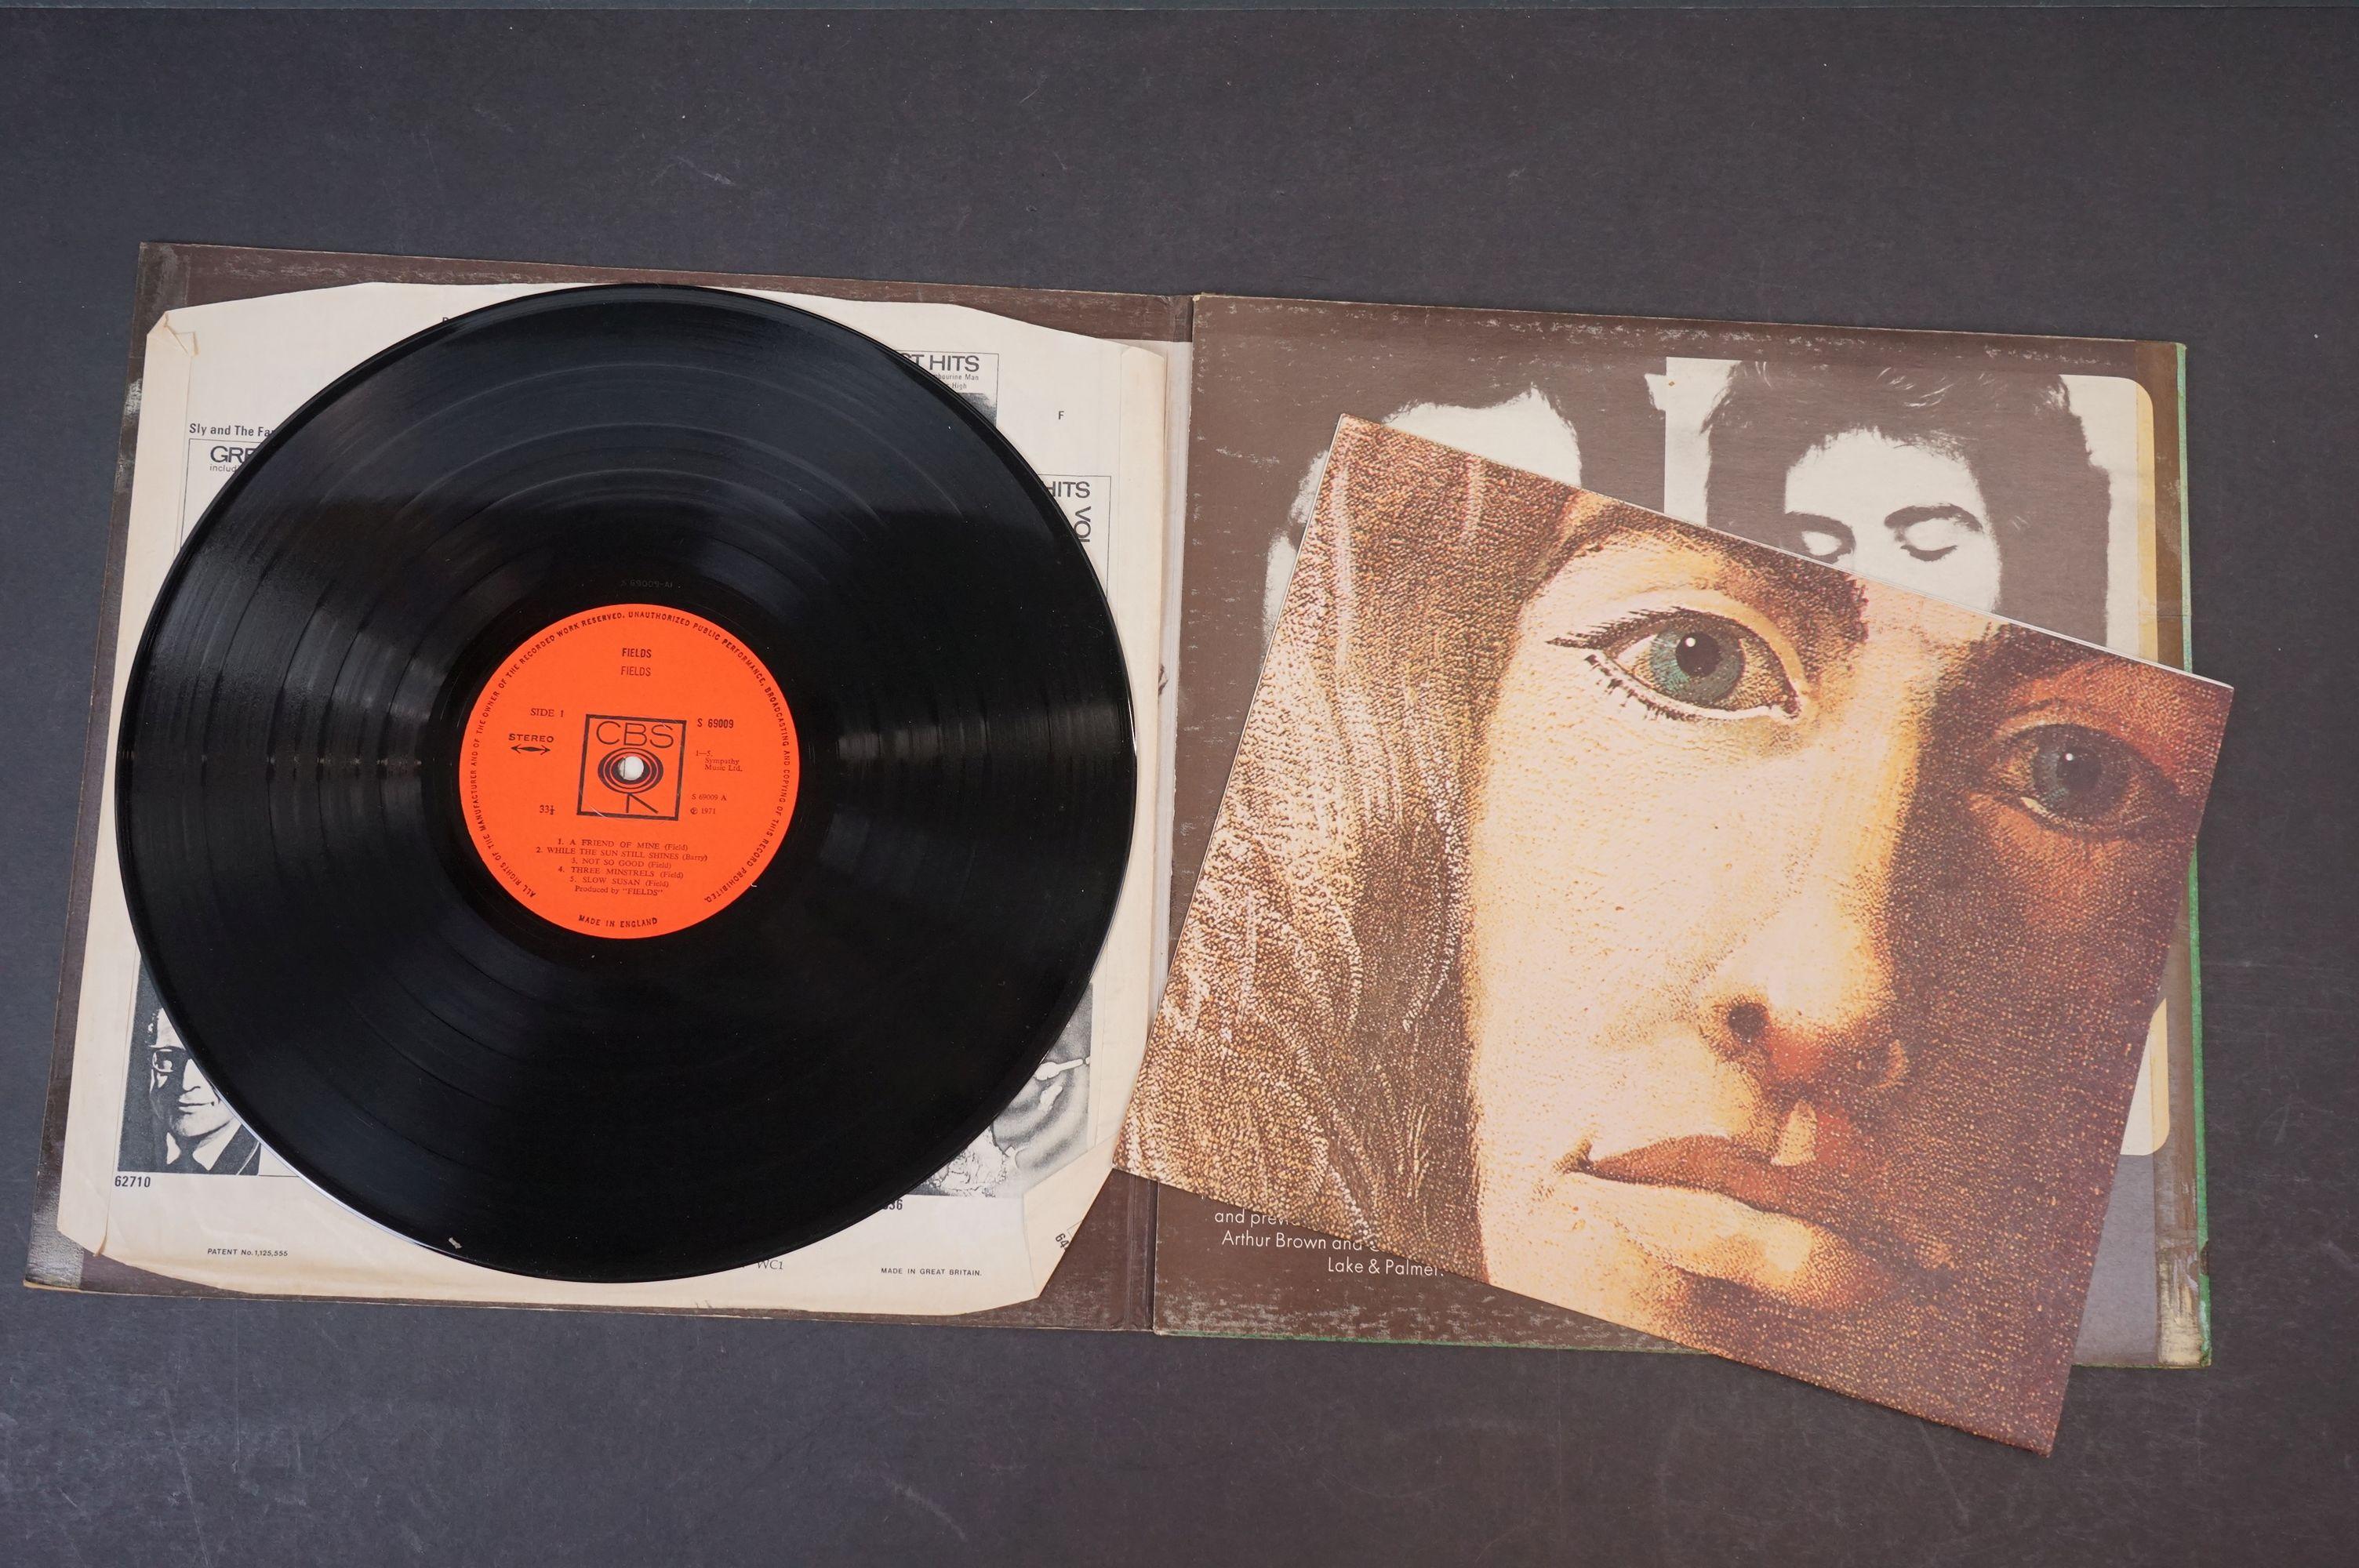 Vinyl - Prog Rock - Fields - Fields. UK 1st 1971 pressing with scarce poster, gatefold sleeve is - Image 4 of 6